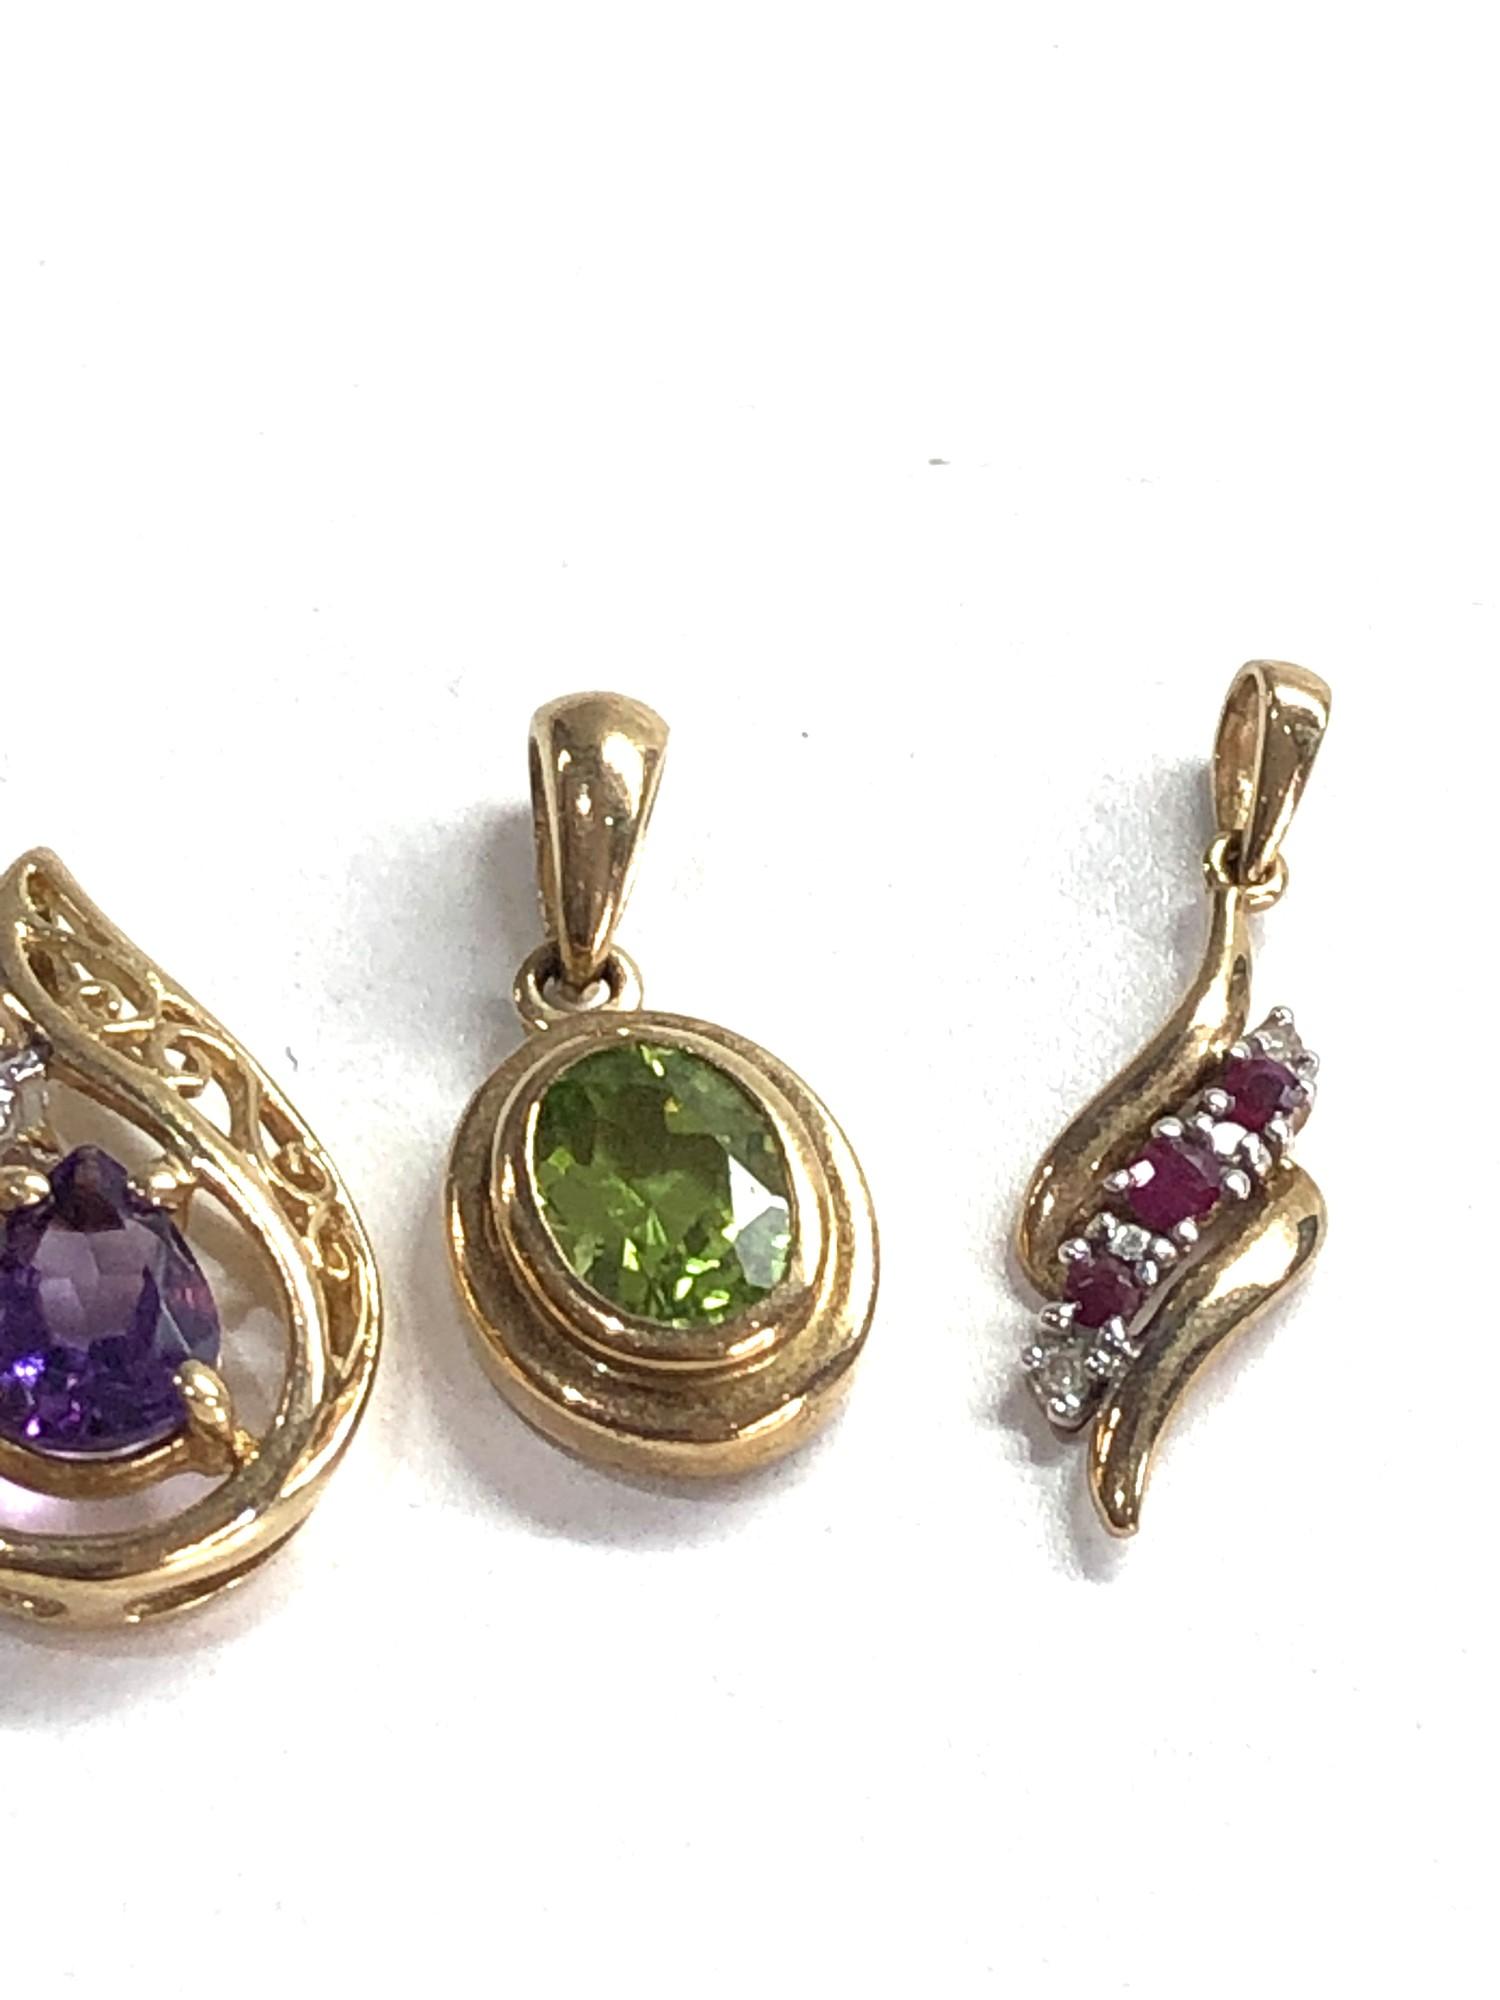 4 x 9ct gold gemstone pendants inc. peridot, amethyst - Image 3 of 3